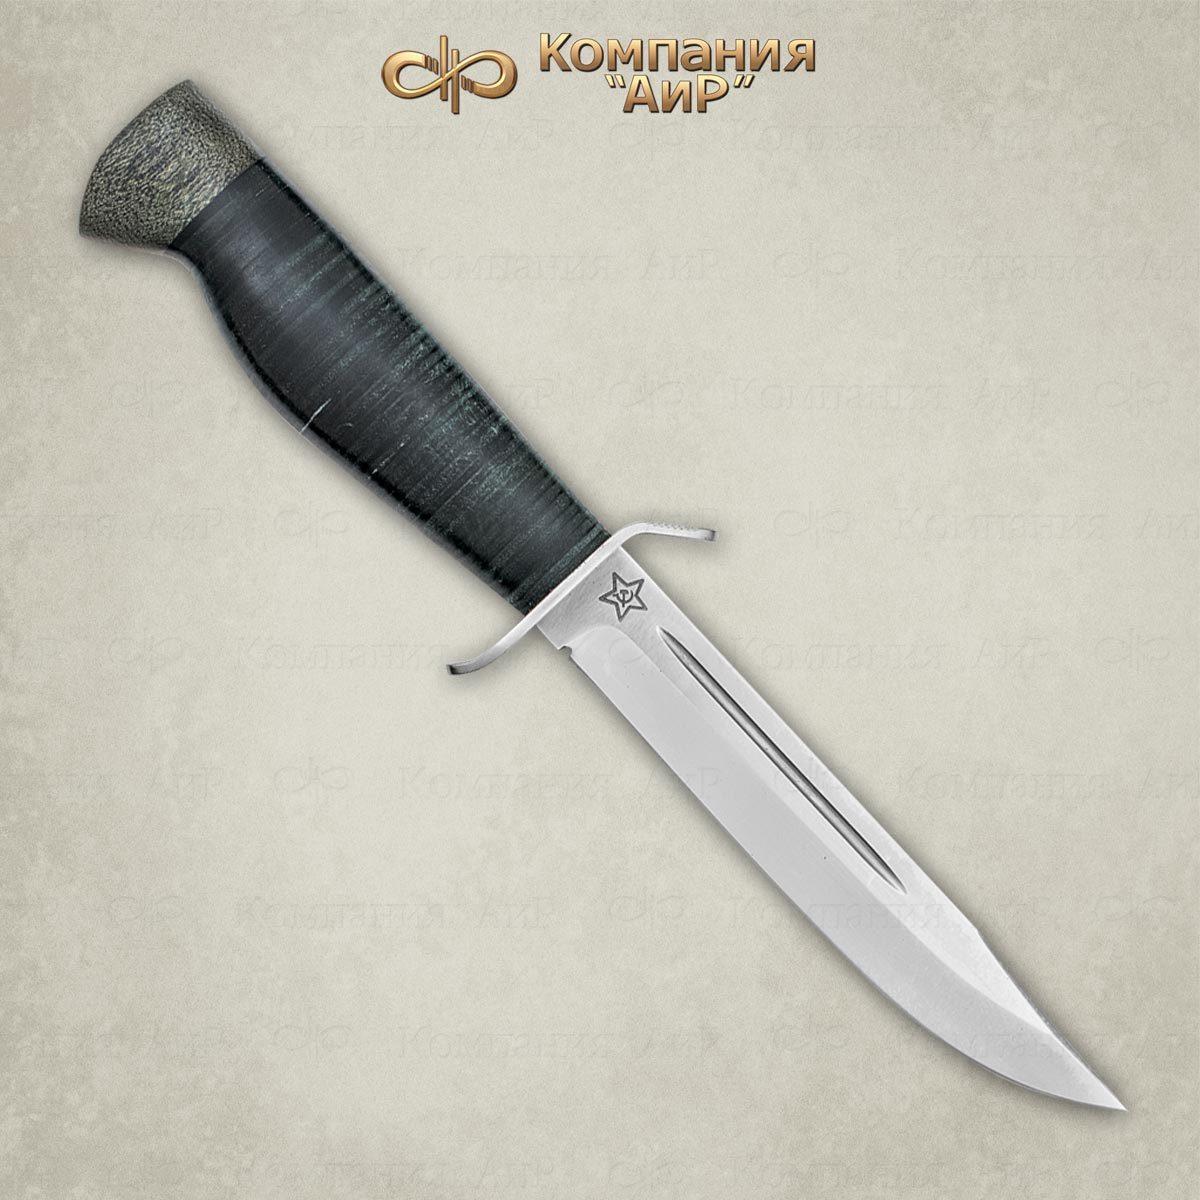 Фото - Нож разделочный АиР Штрафбат, сталь 110х18 М-ШД, рукоять кожа нож аир хазар сталь 110х18 м шд рукоять кожа